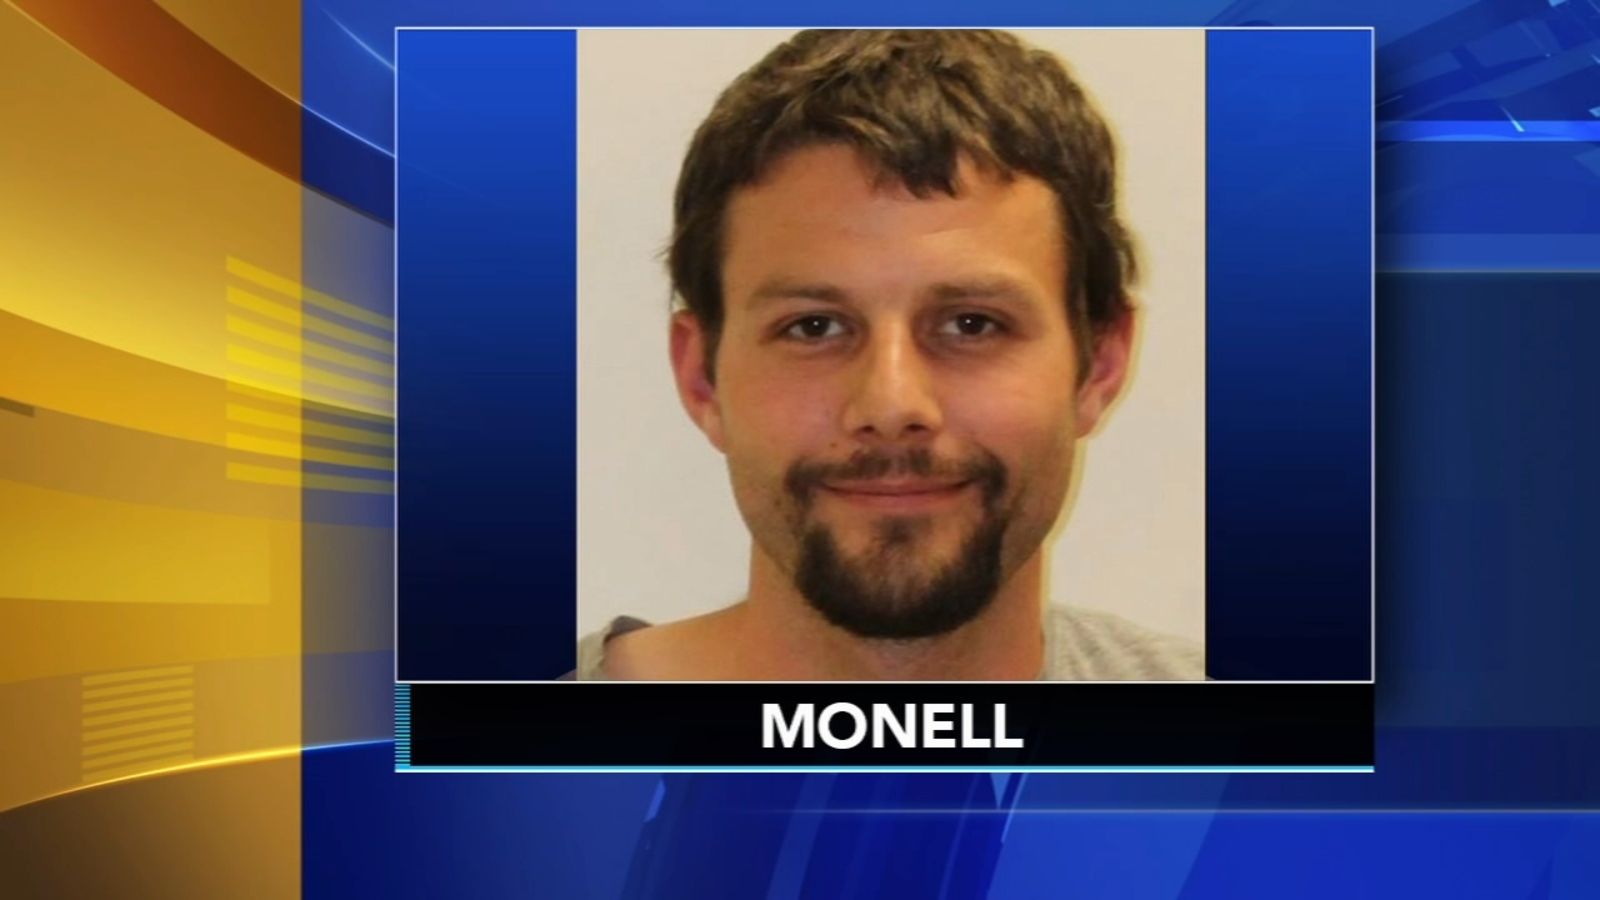 Man Arrested in Rosie ODonnell Missing-Daughter Case Sent